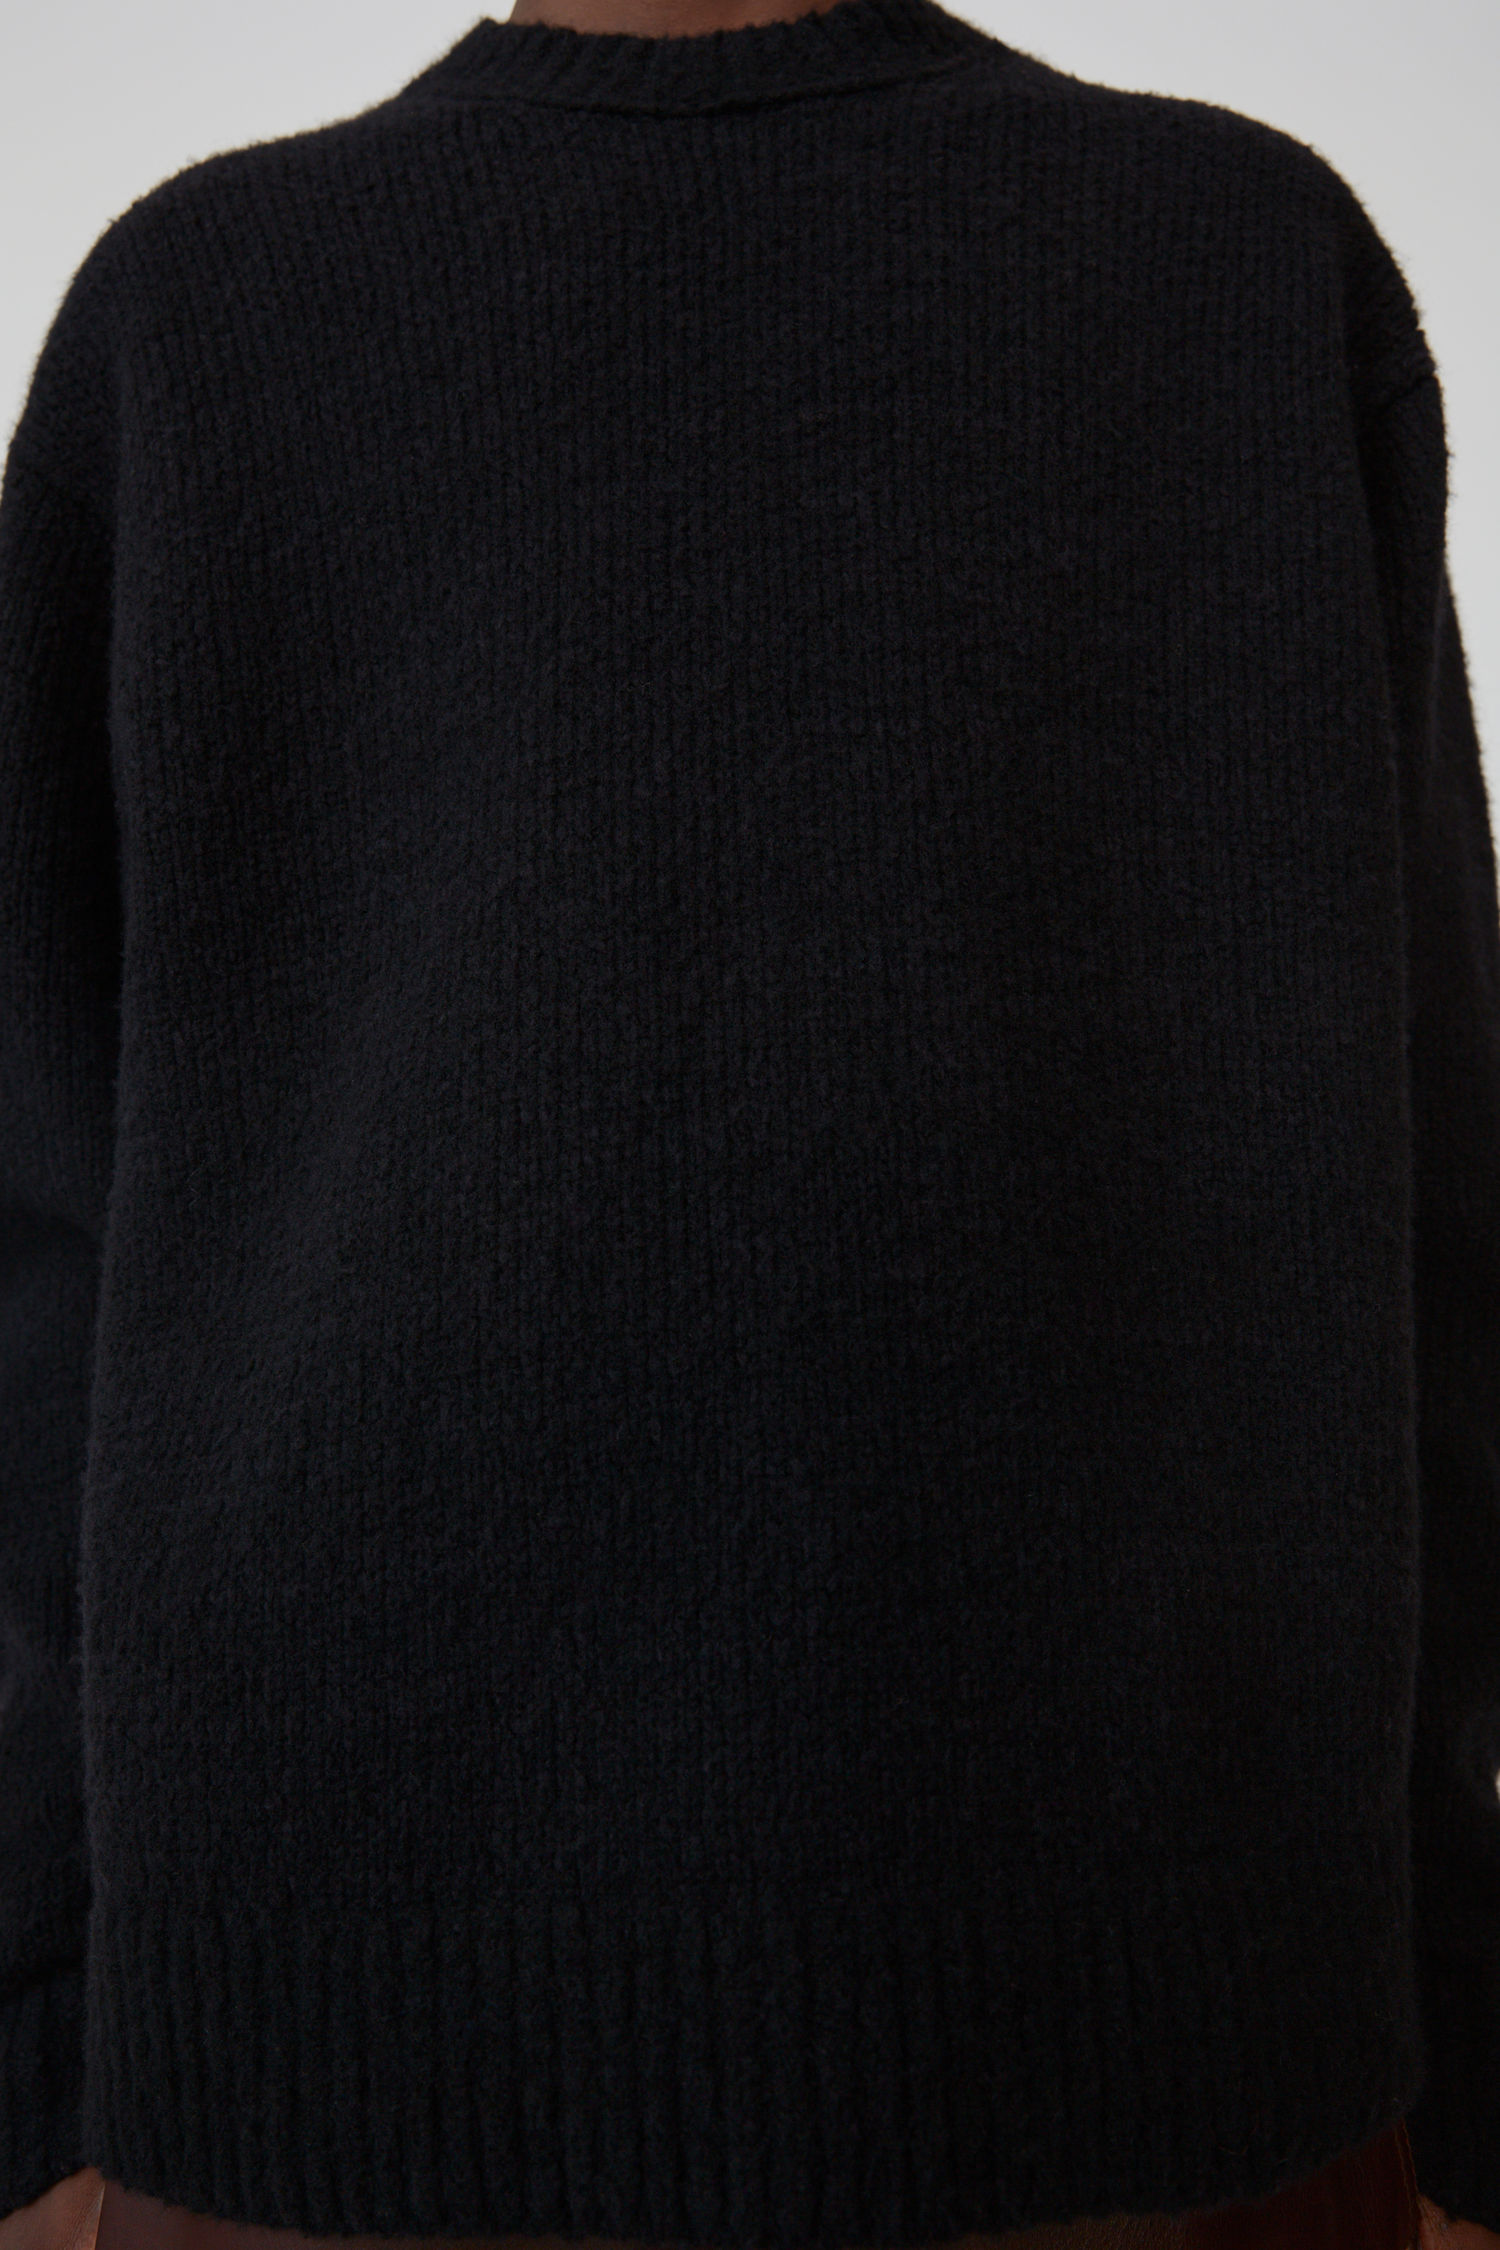 acne_studios_Relaxed_crewneck_sweater_all_black_2.jpg